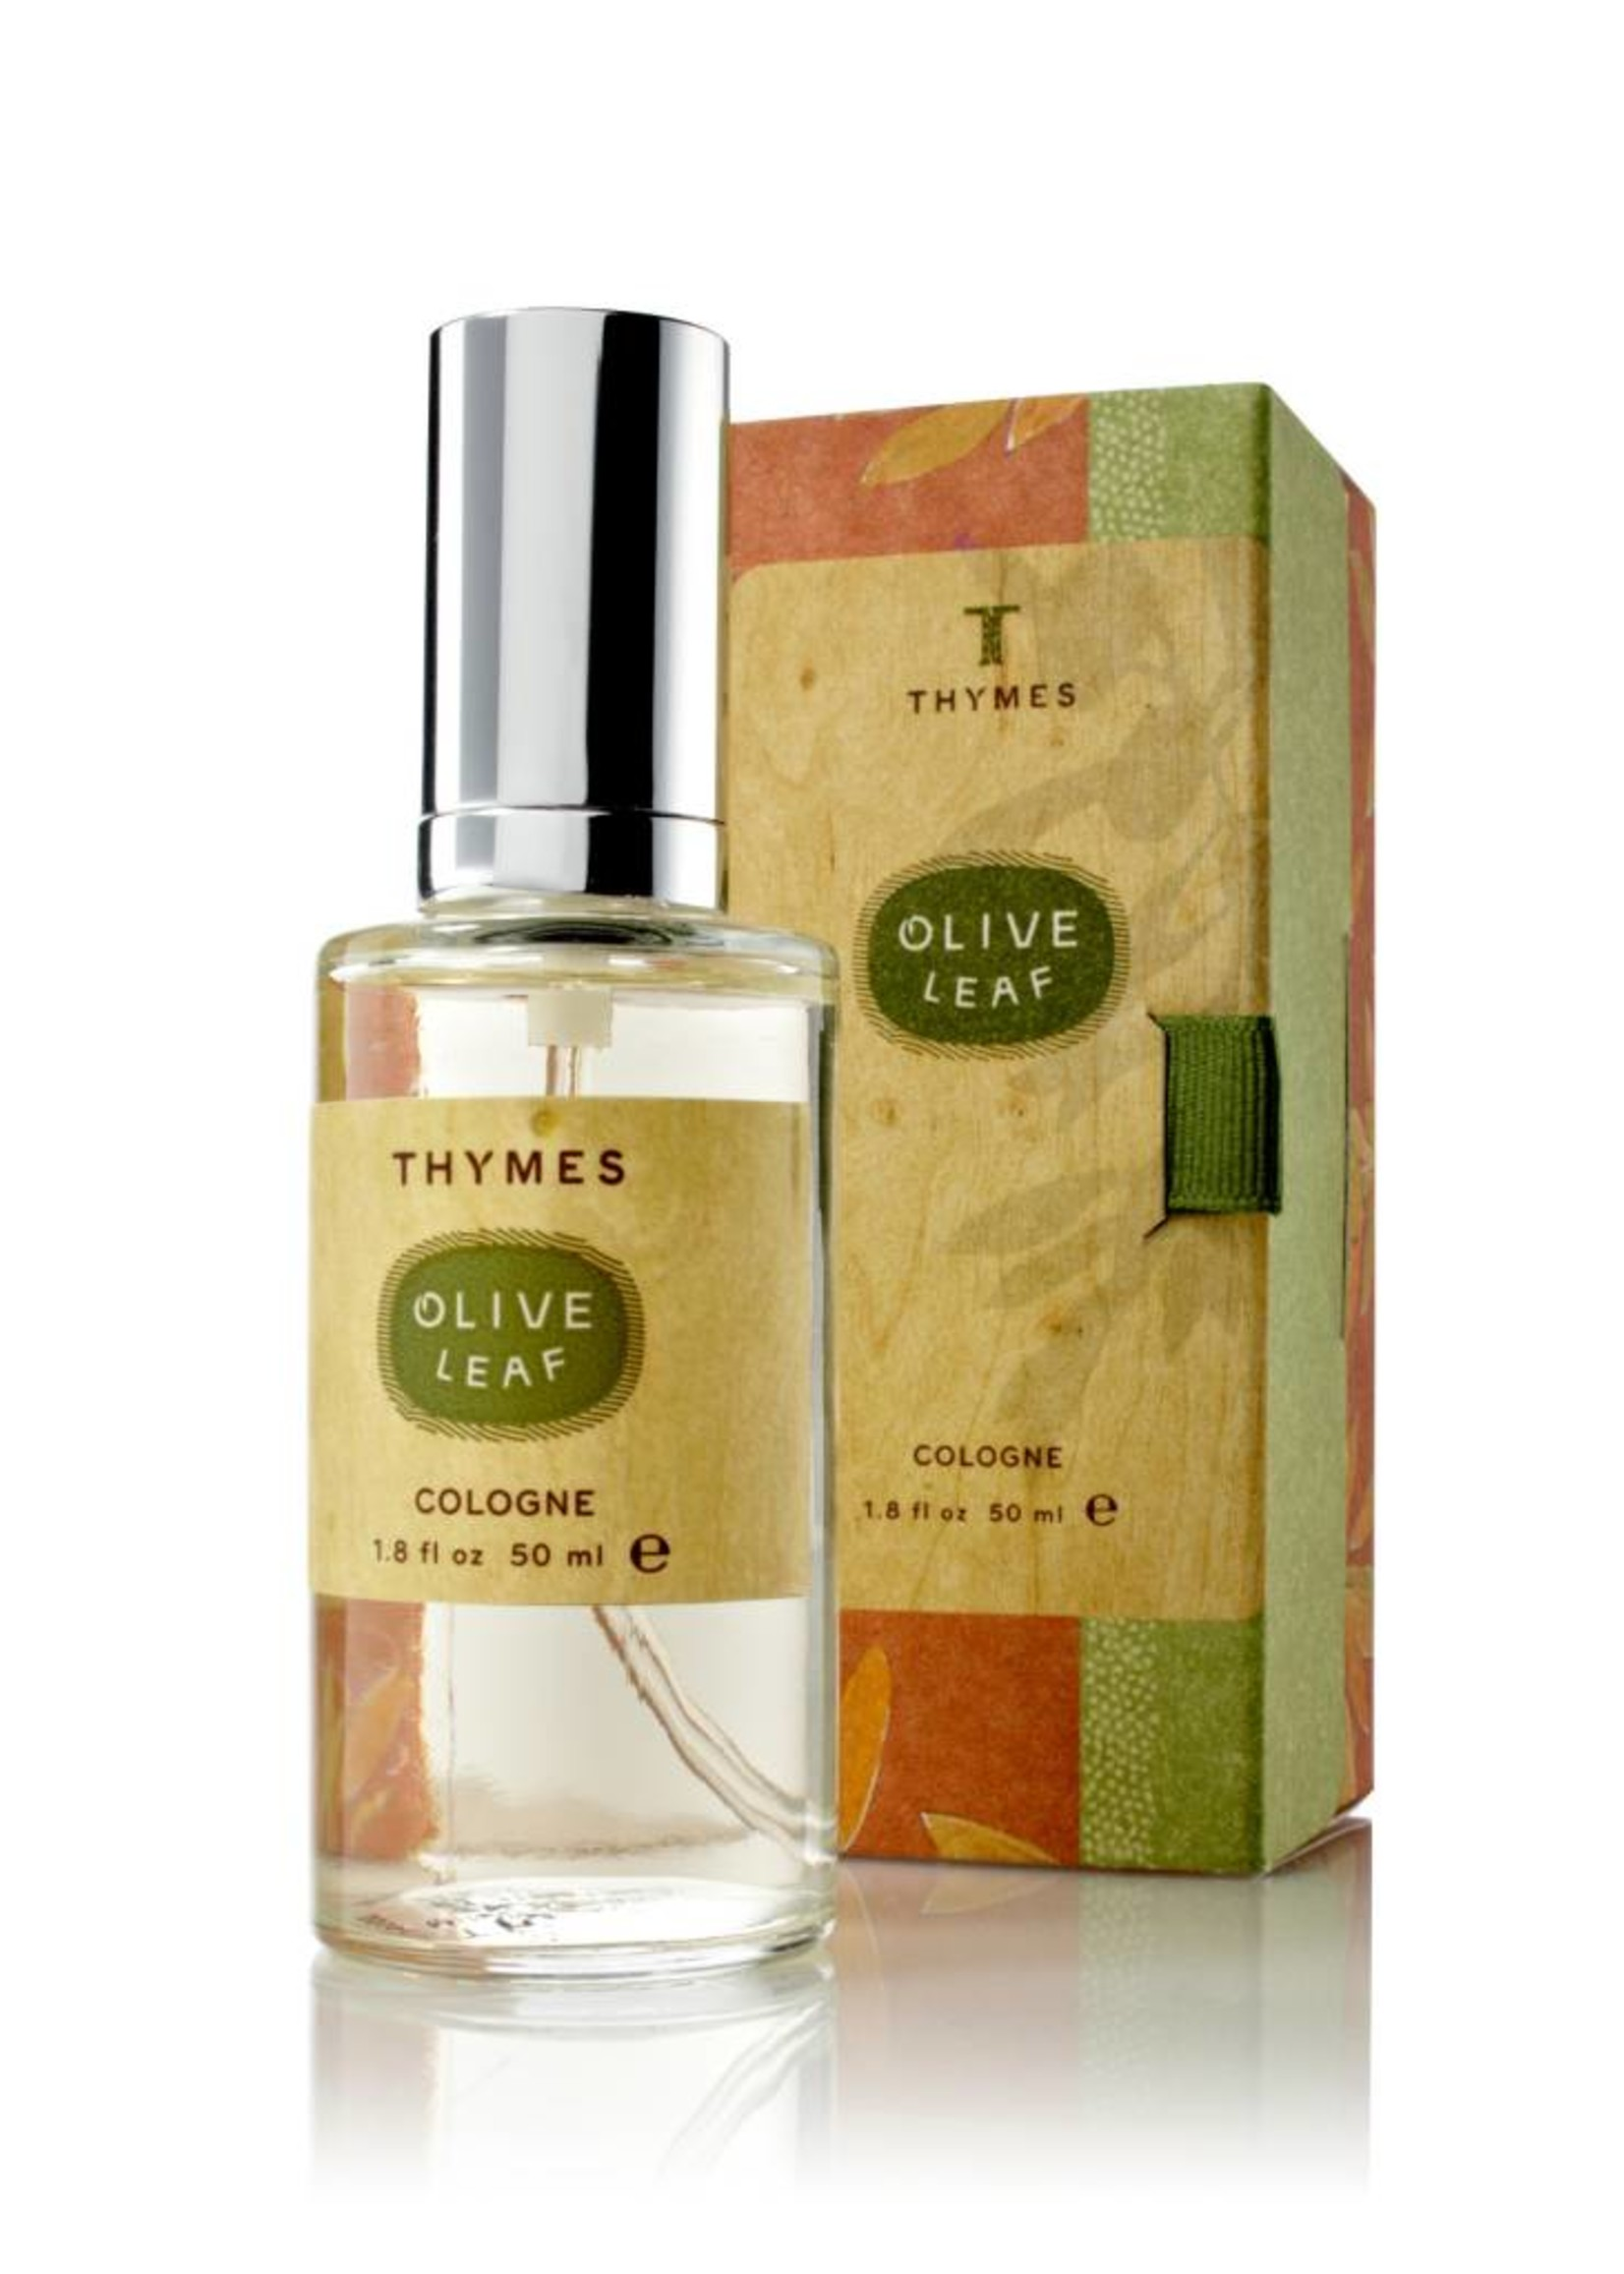 Thymes Olive Leaf Cologne